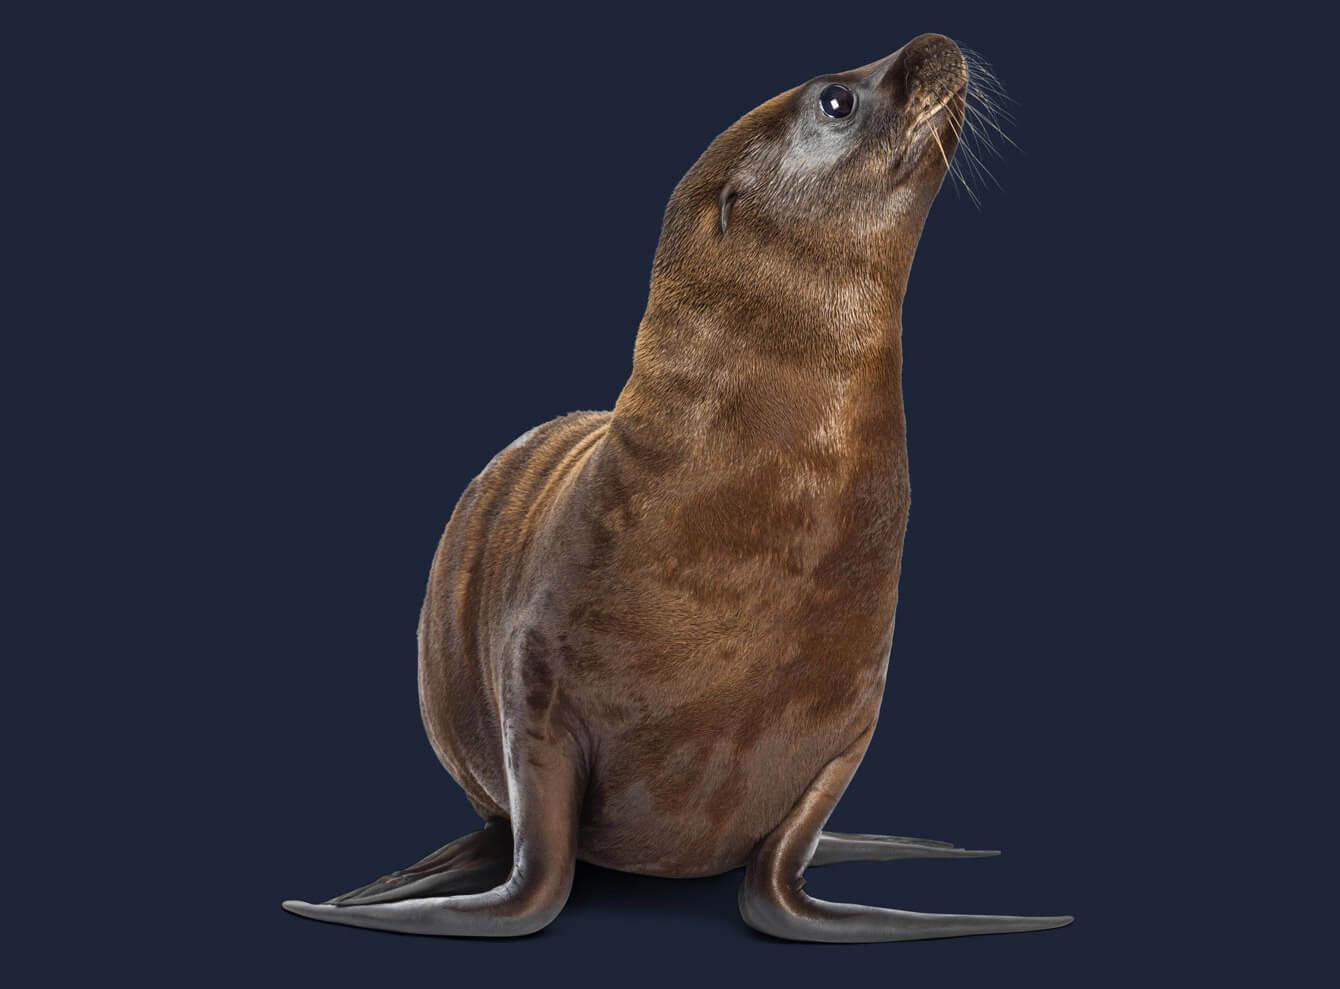 Freistellen Bildbearbeitung Tiere Seelöwe